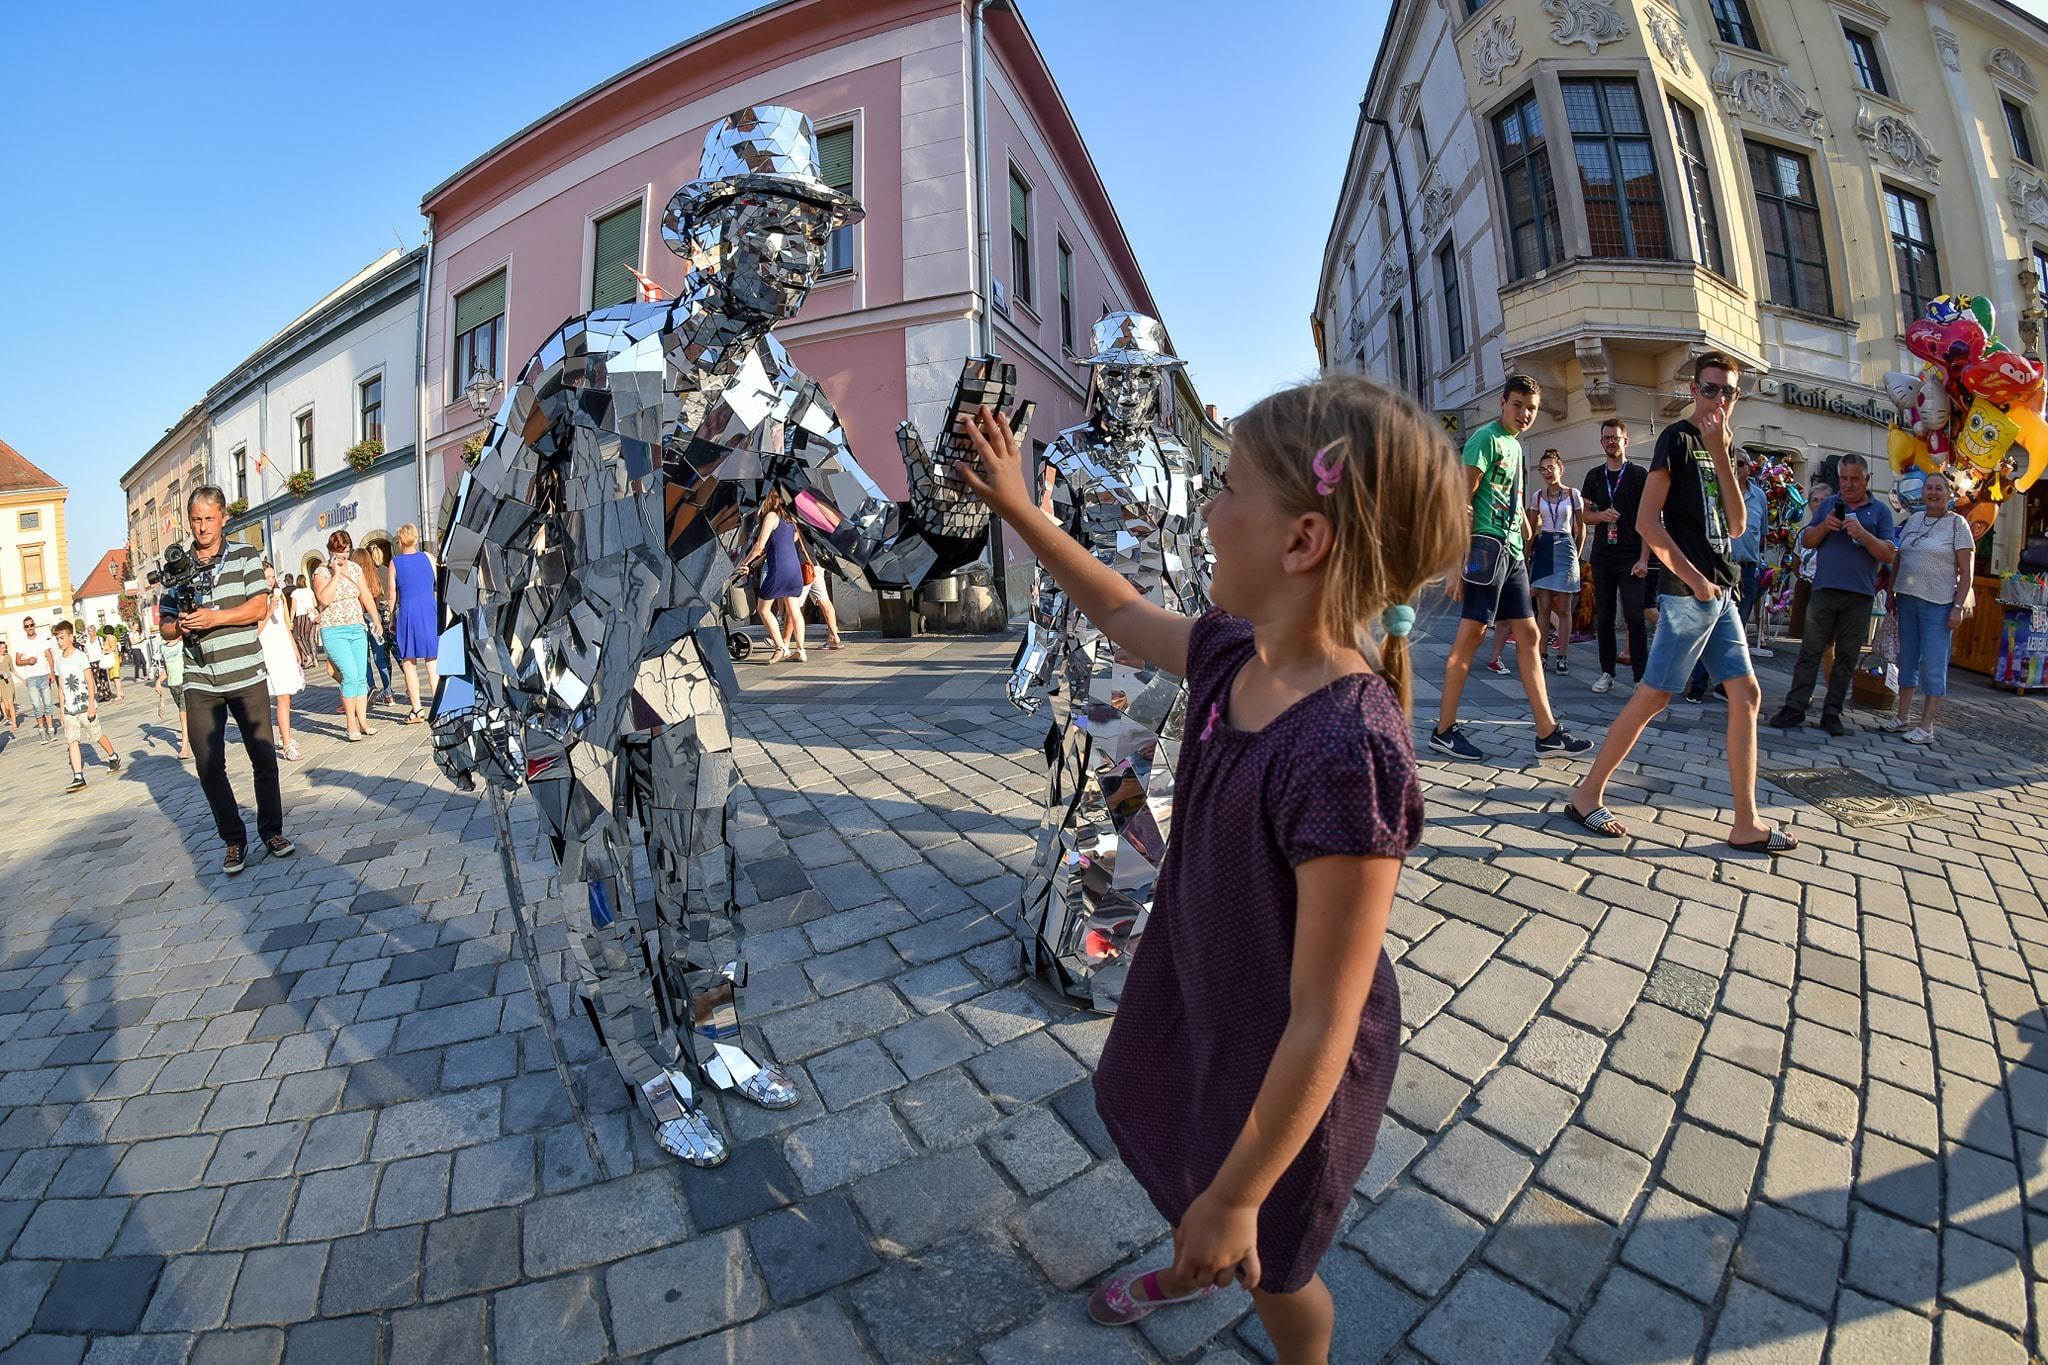 Špancirfest: Varaždin prepares for its biggest annual event